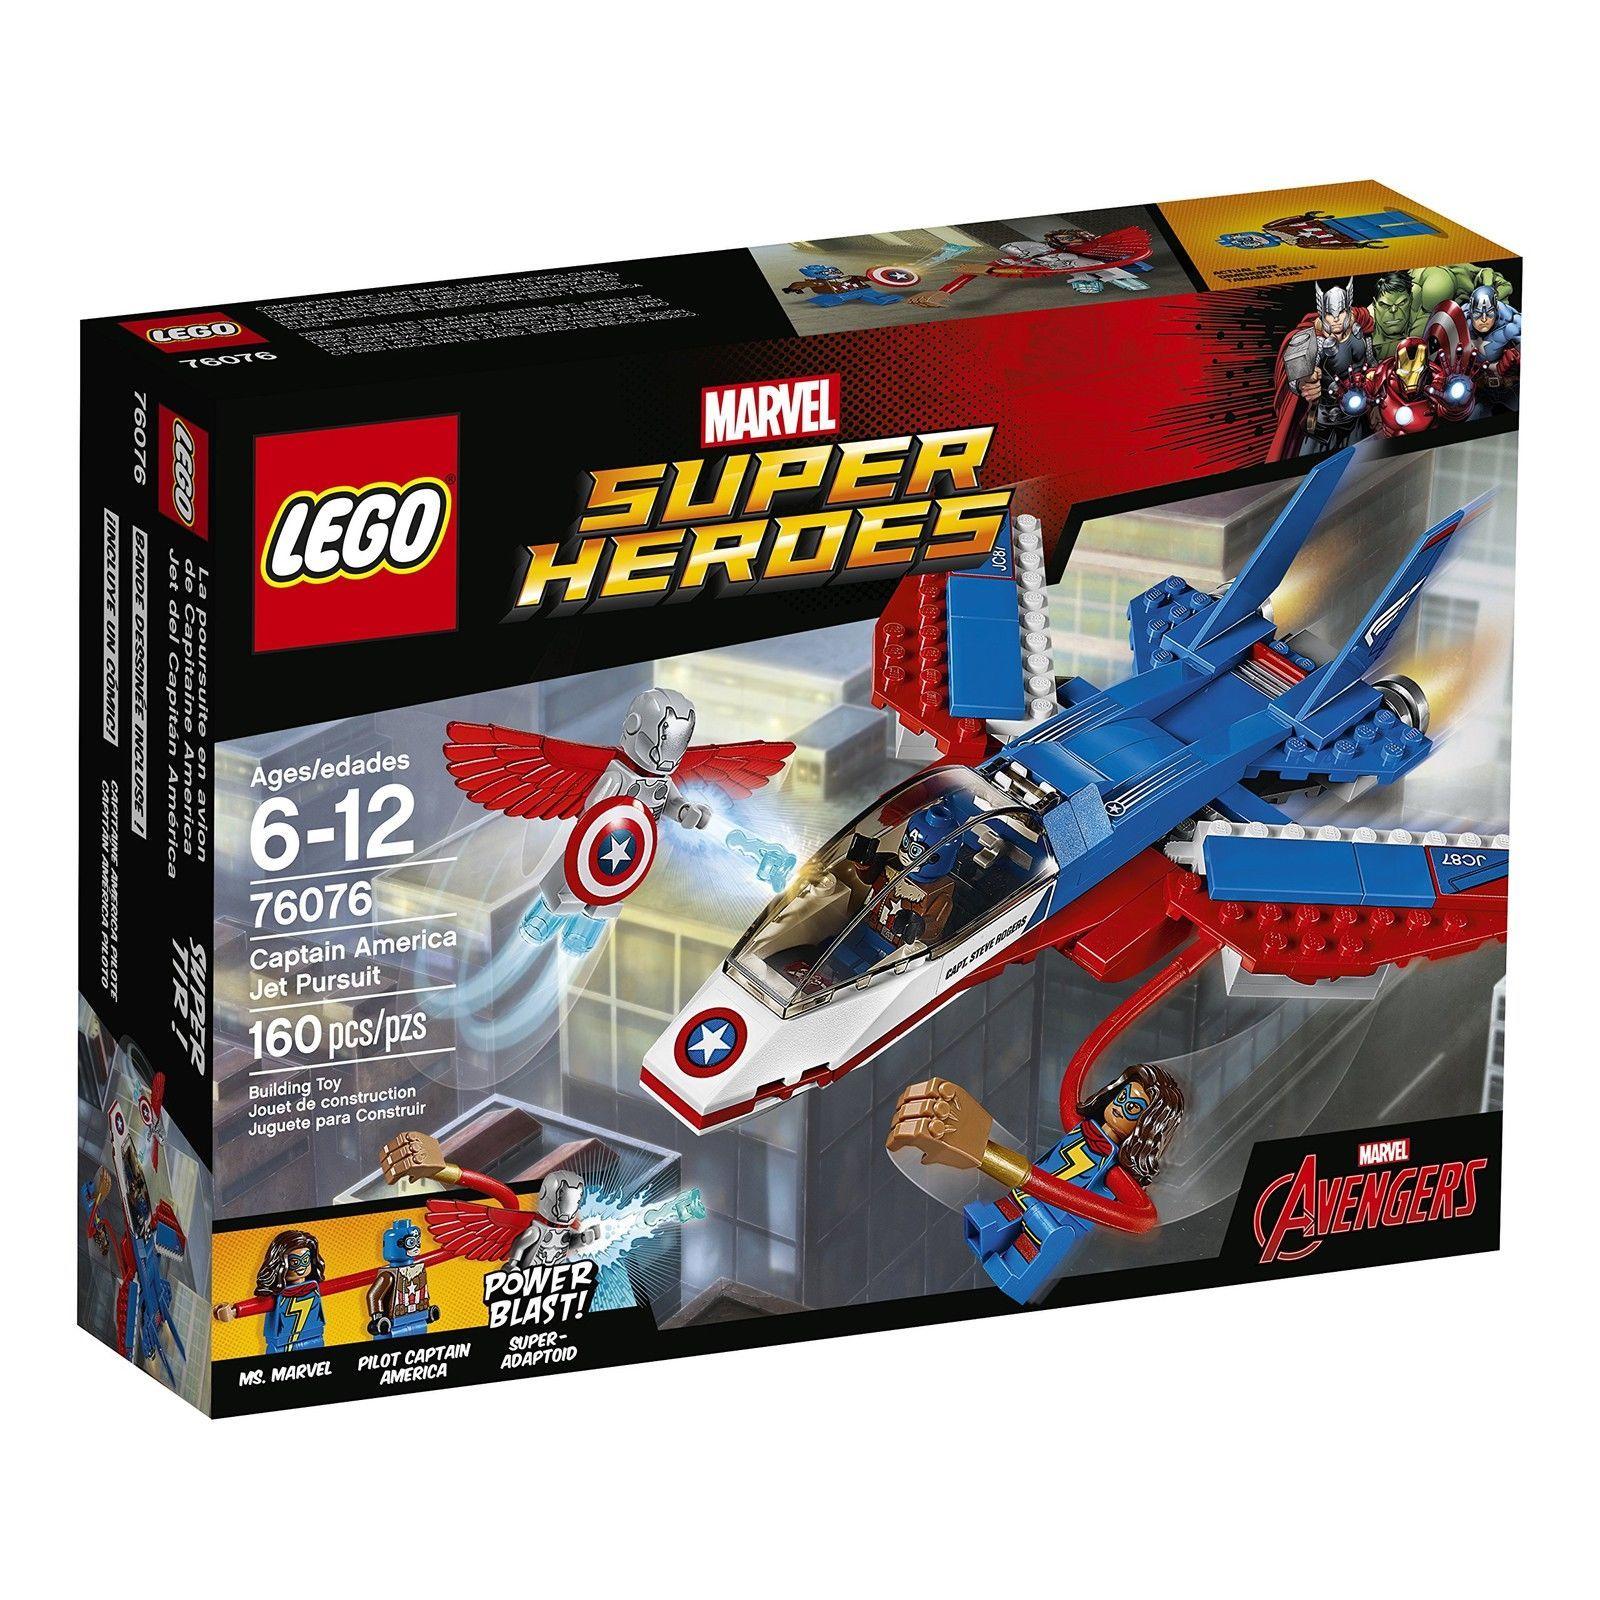 LEGO Marvel Super Heroes Captain America Jet Pursuit 76076 Building Kit New